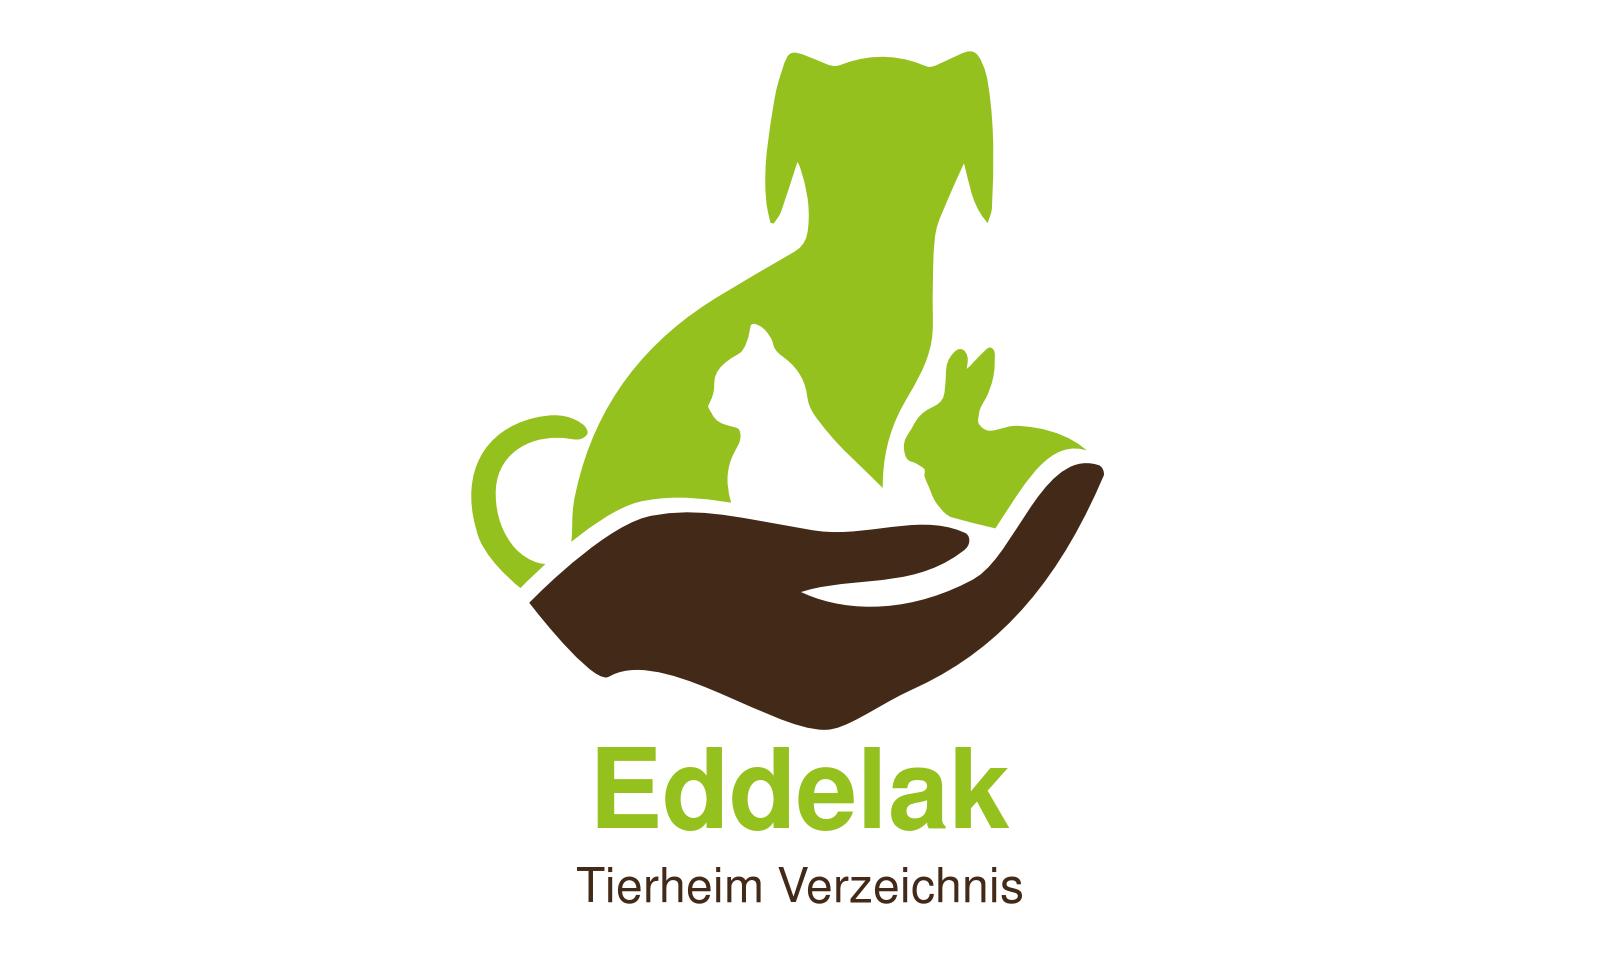 Tierheim Eddelak